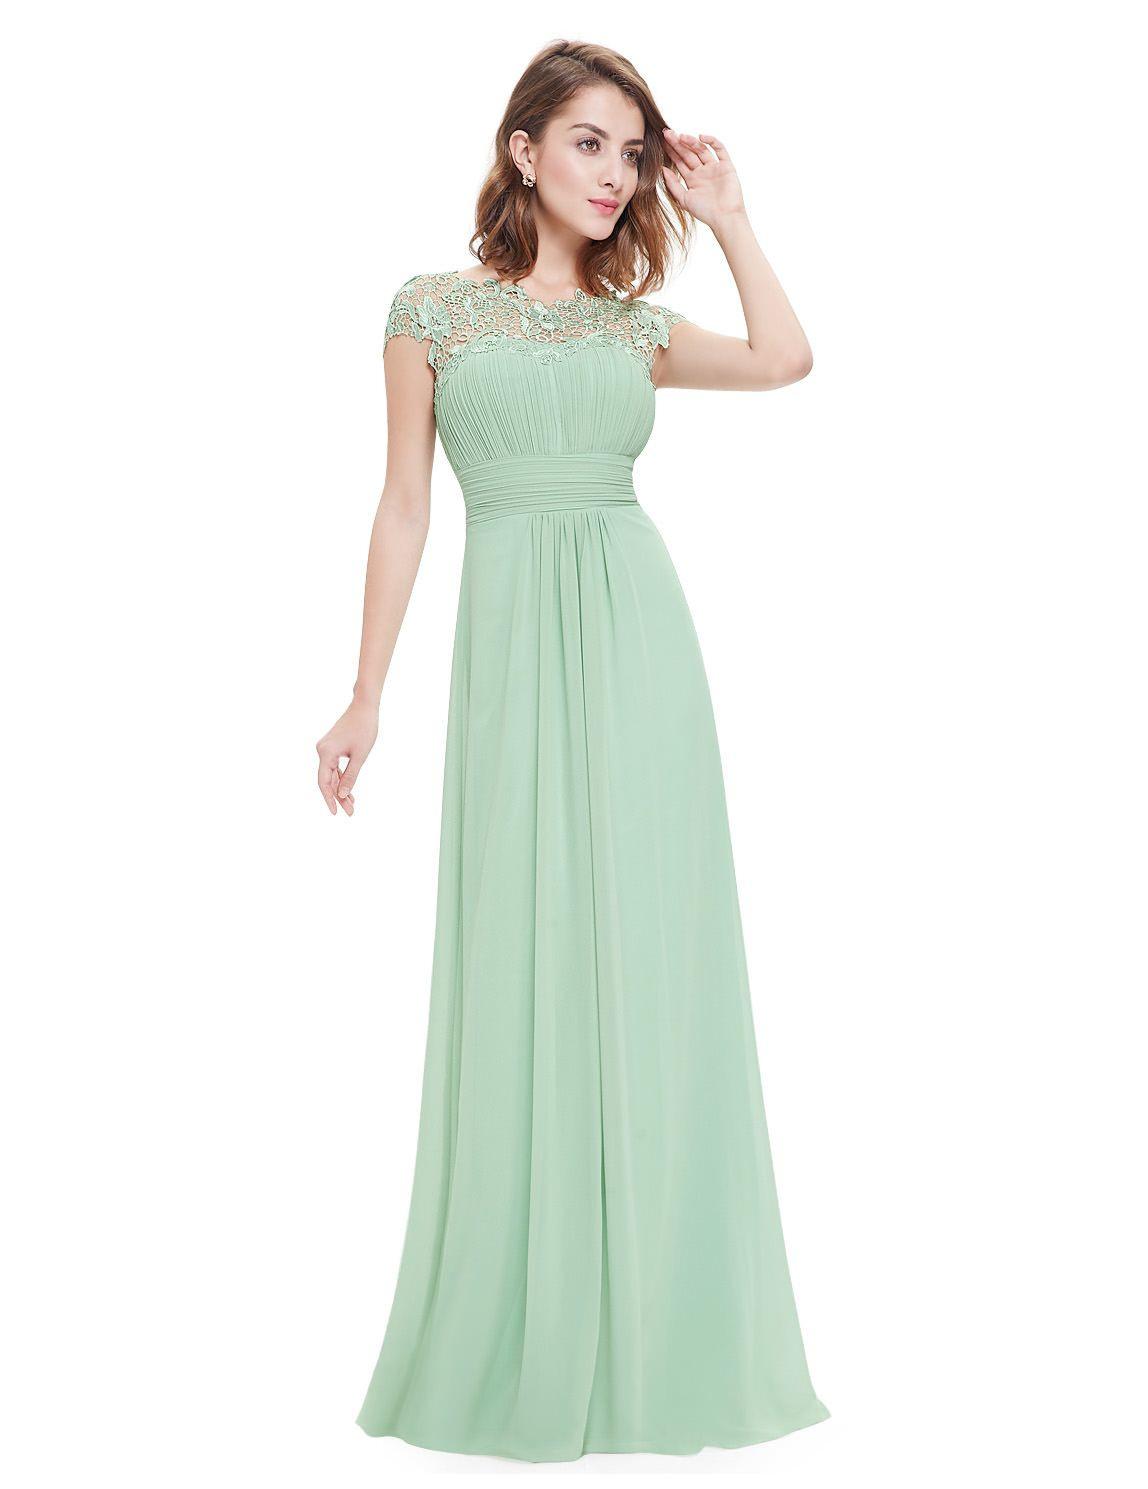 10 Erstaunlich Kleid Mintgrün Lang VertriebDesigner Ausgezeichnet Kleid Mintgrün Lang Galerie